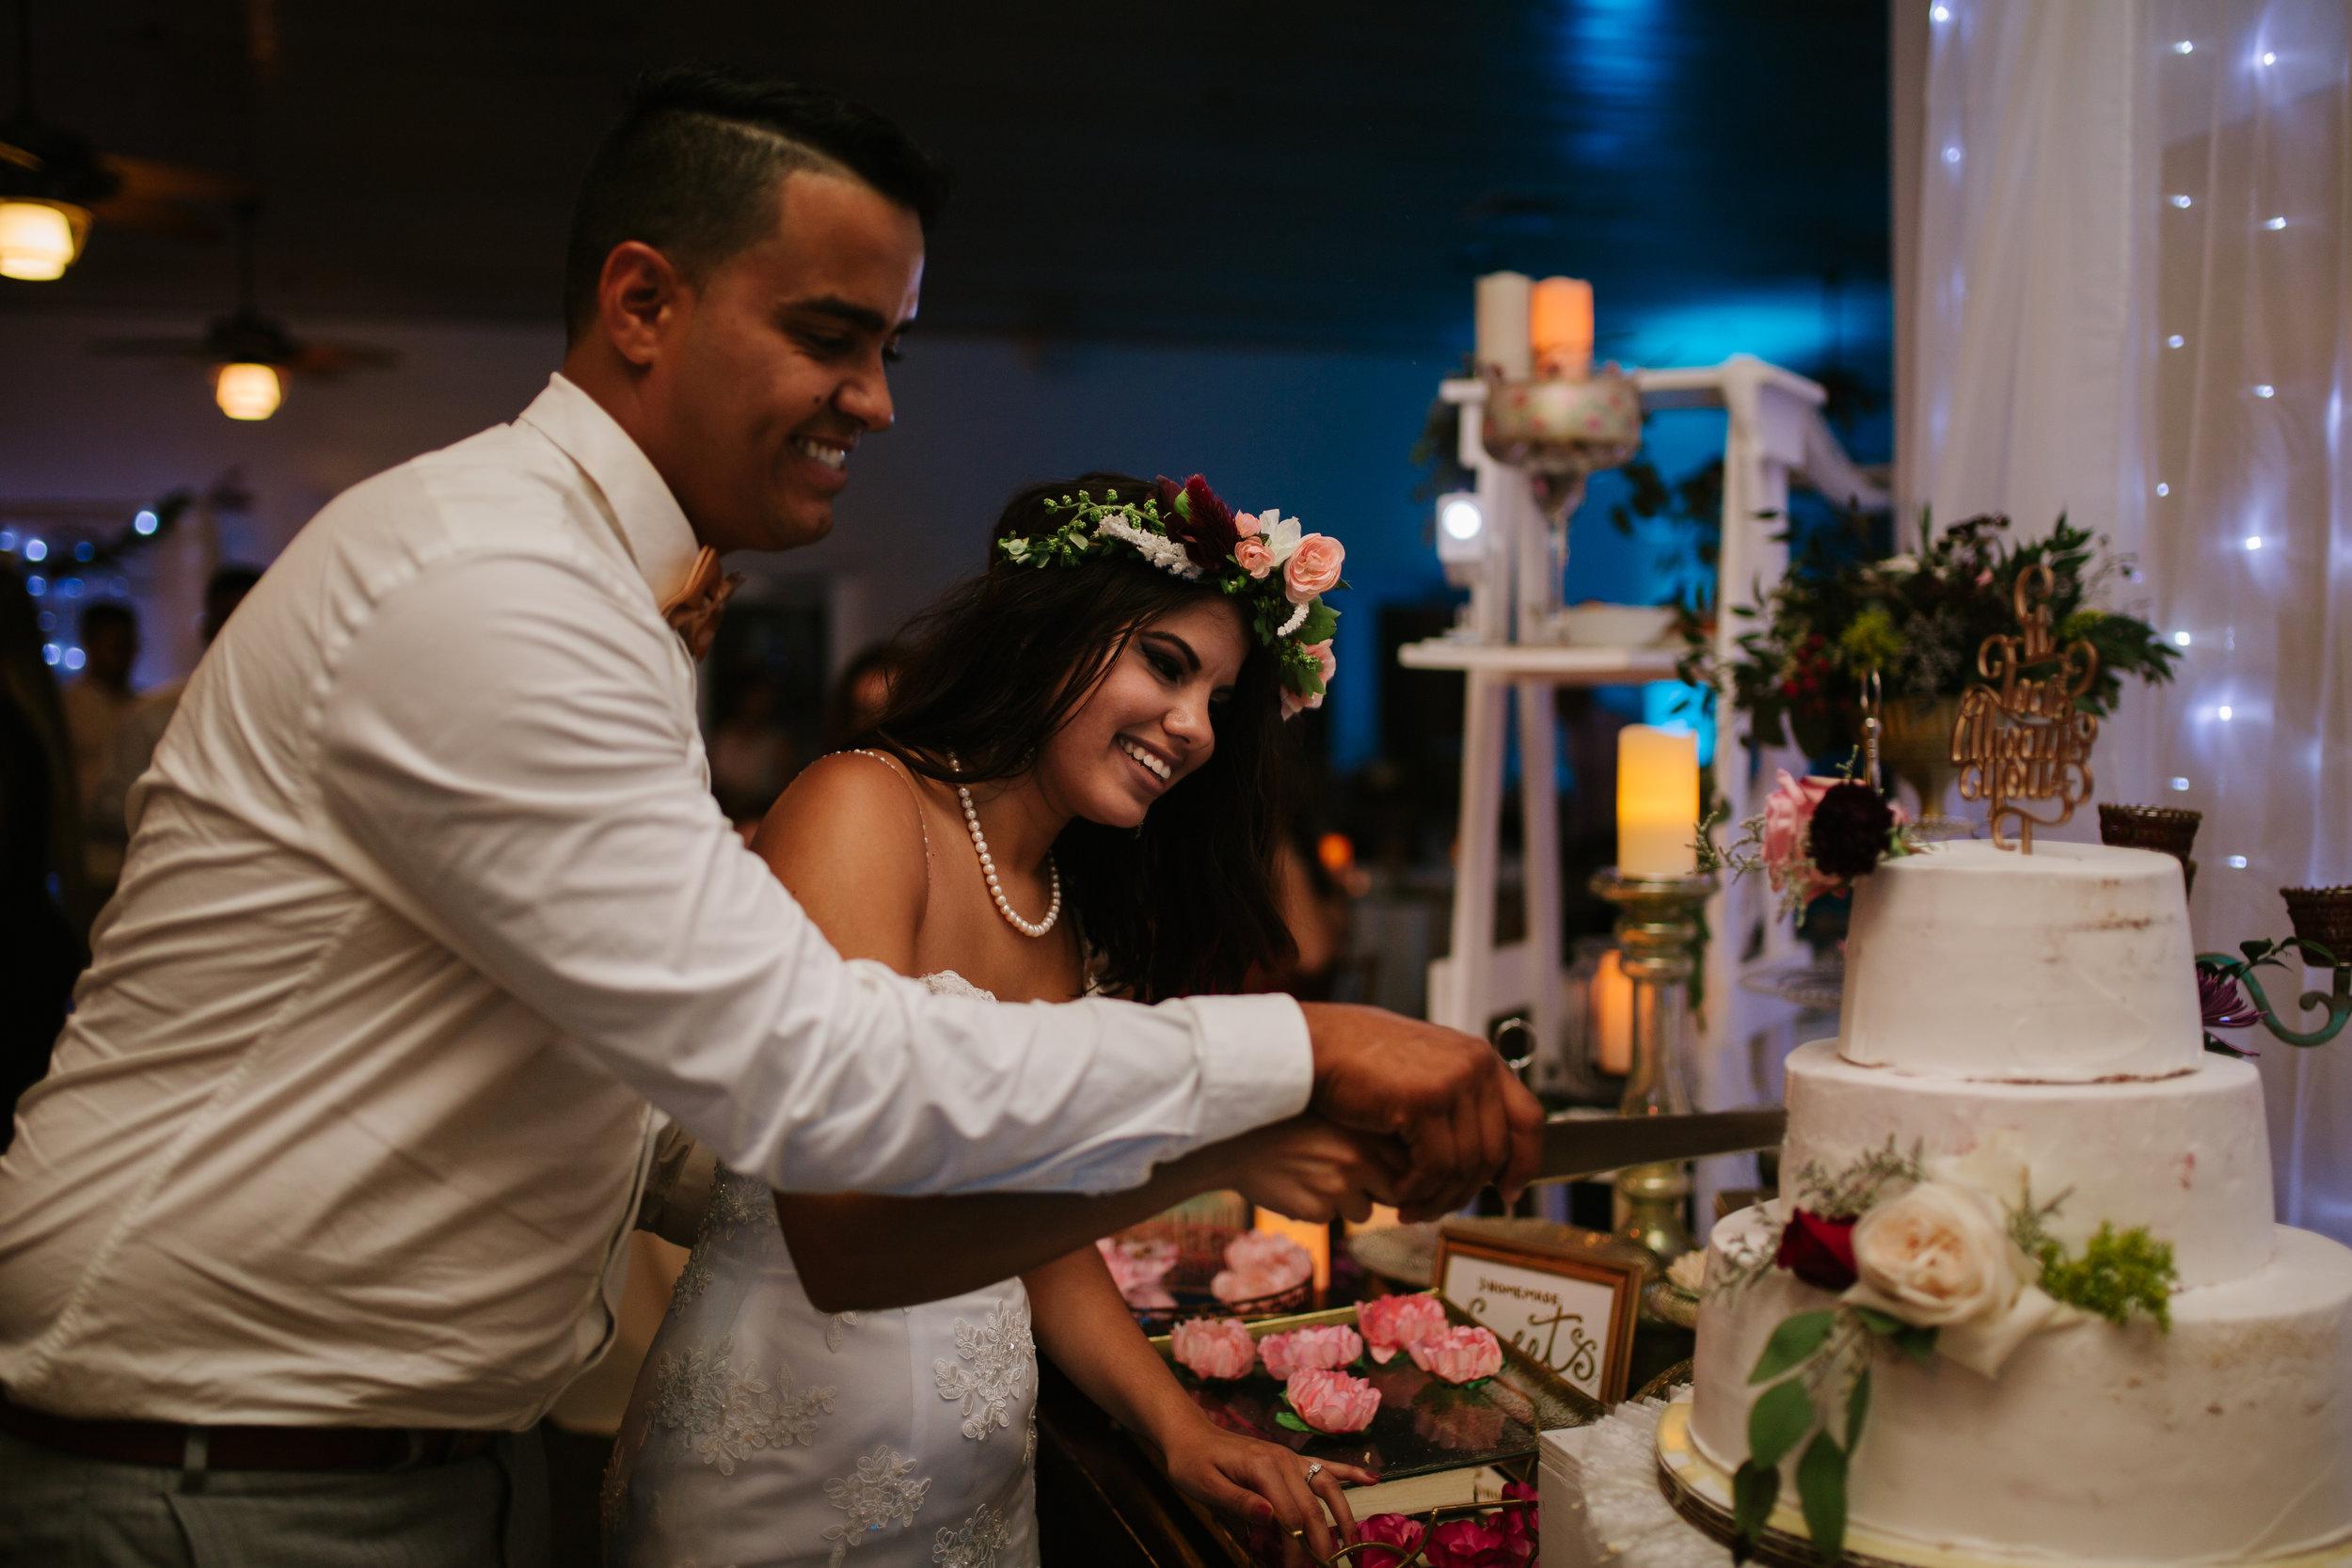 2017.05.23 Barbara and Mauricio Sales Port St Lucie Wedding (745 of 772).jpg